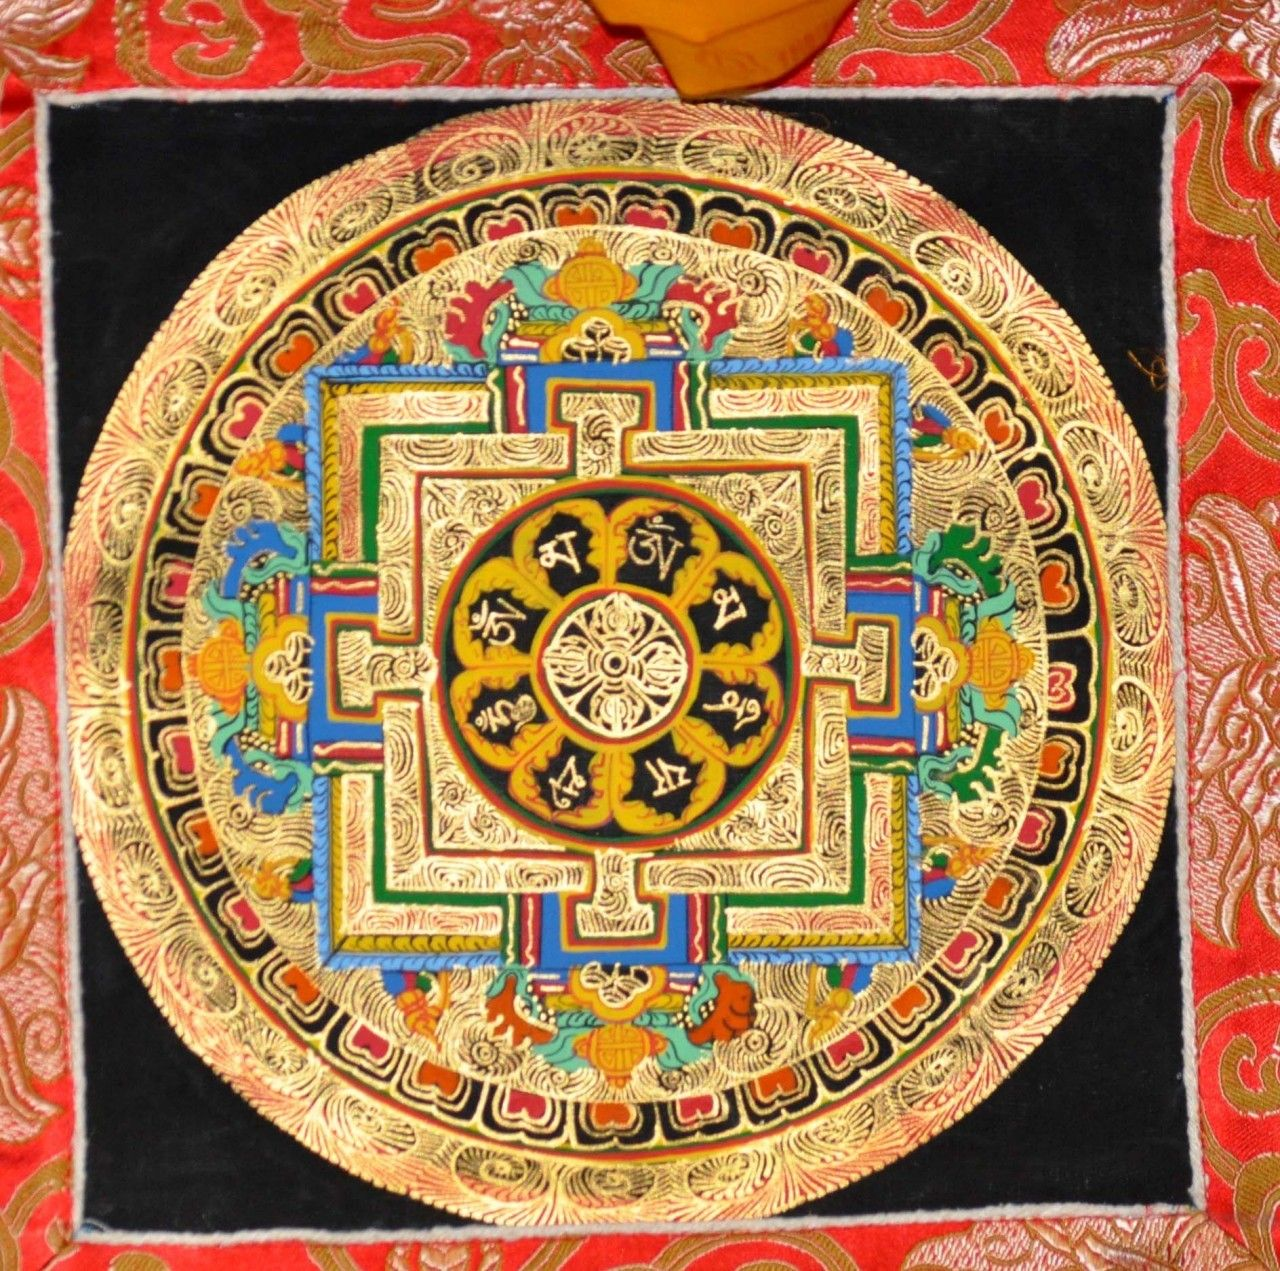 Mandala sanskrit maala circle is a spiritual mandala sanskrit maala circle is a spiritual and ritual symbol in hinduism and buddhism representing the universe biocorpaavc Images